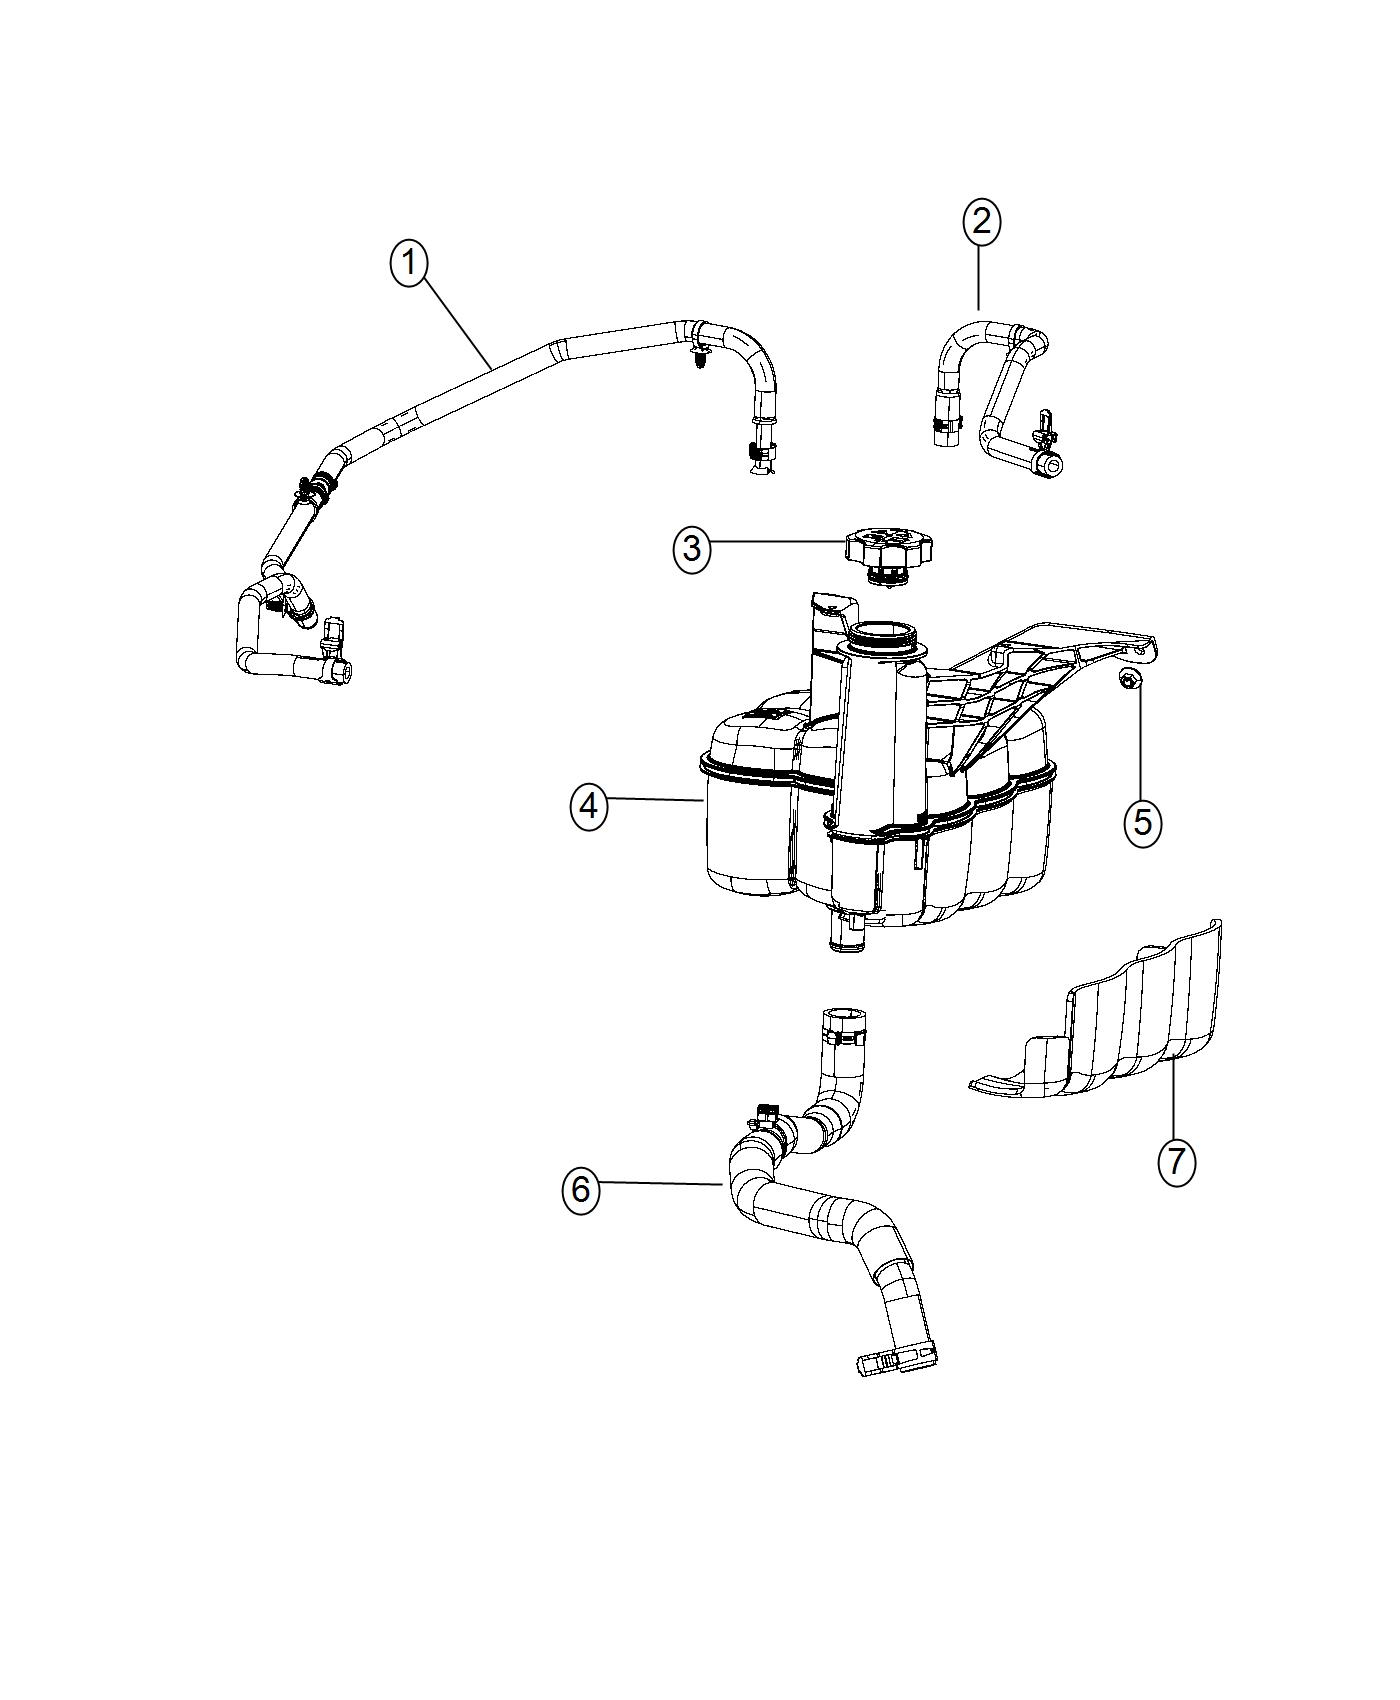 Ram Bottle Coolant Recovery Maintenance